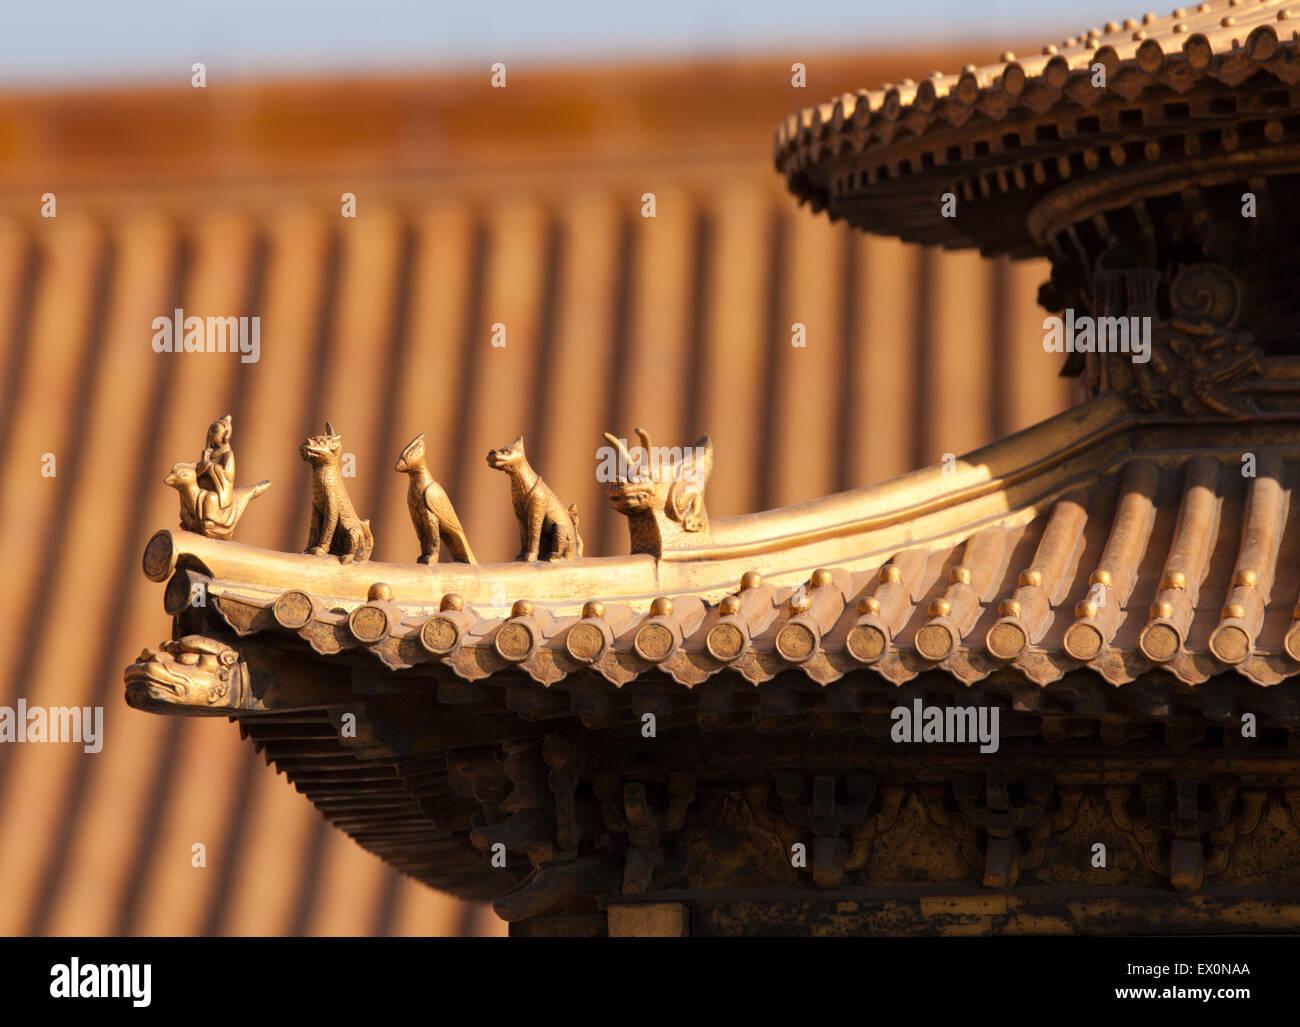 Roof detail, Forbidden City, Beijing, China - Stock Image